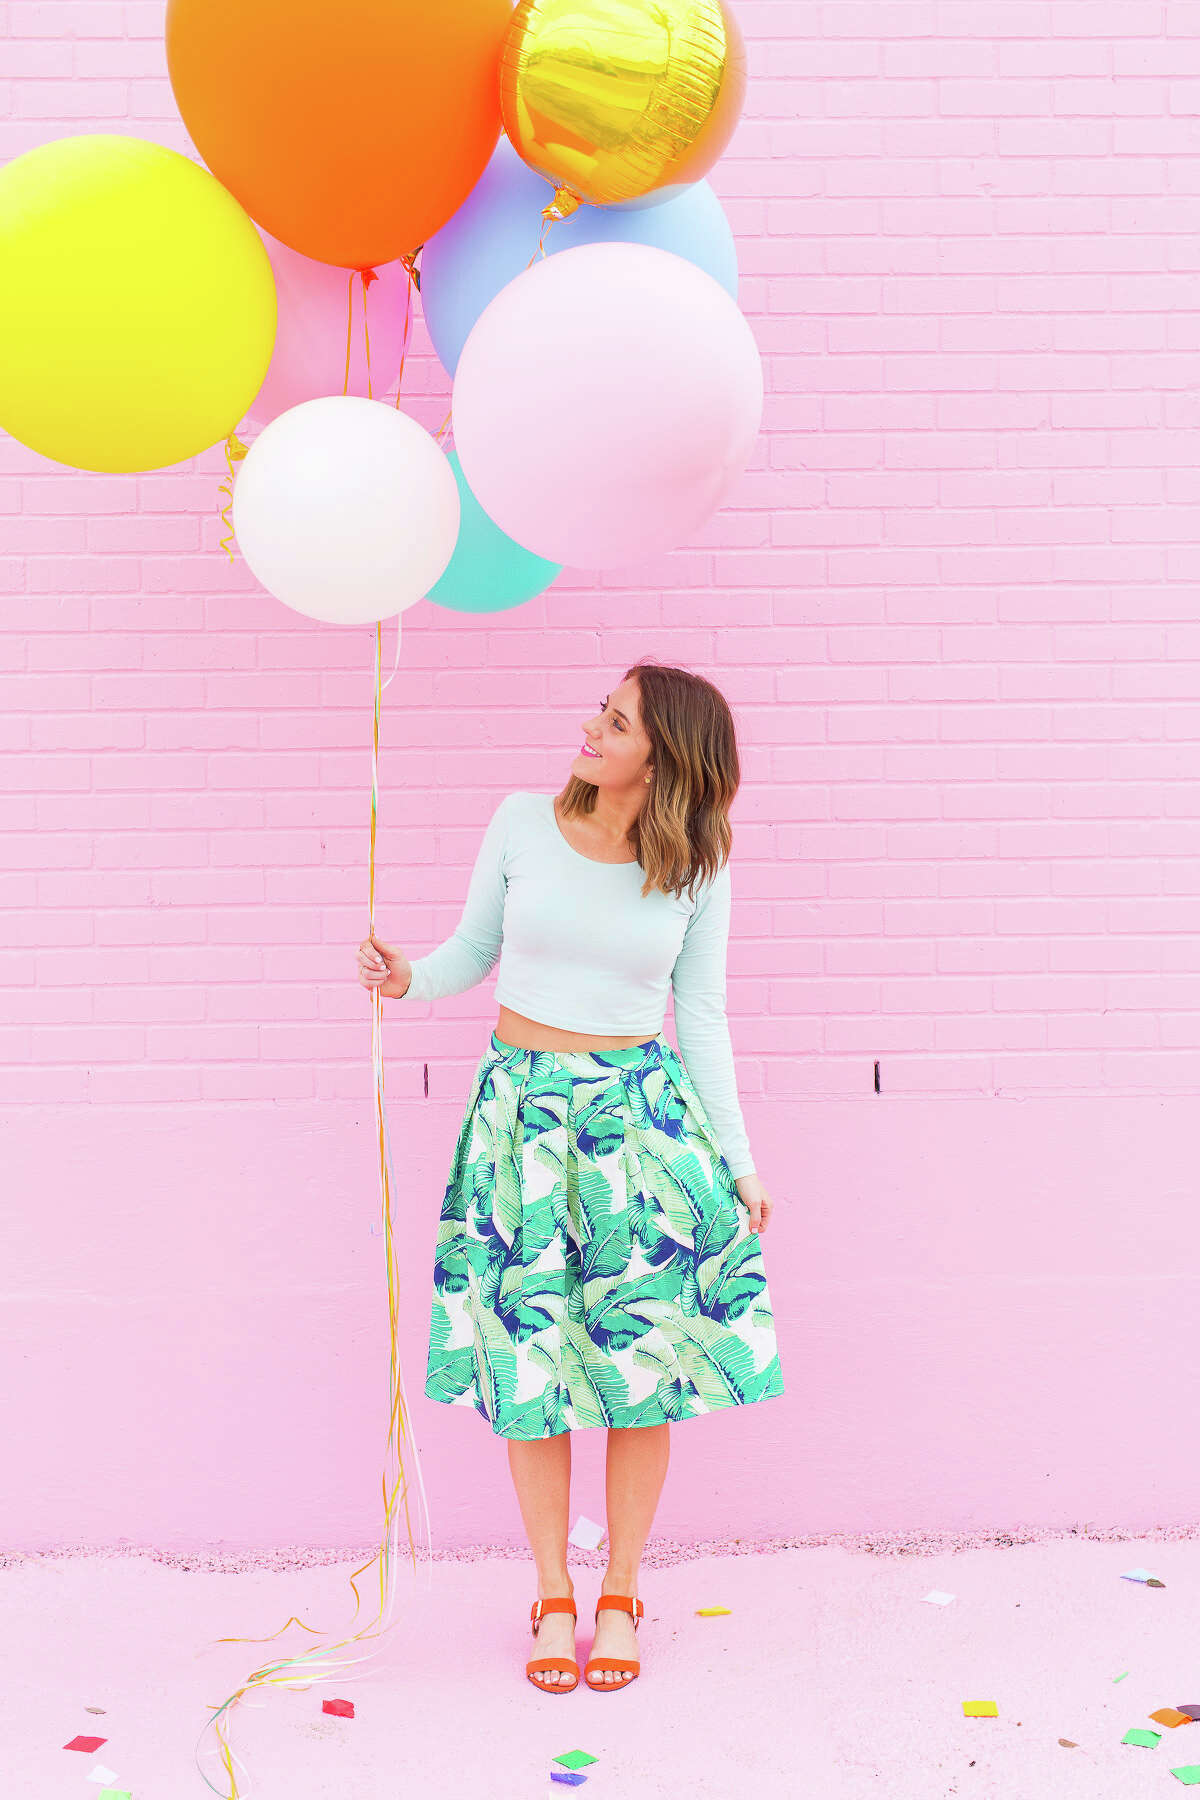 Ashley Rose was working as a waitress when she had the idea to start a DIY blog, Sugar & Cloth.